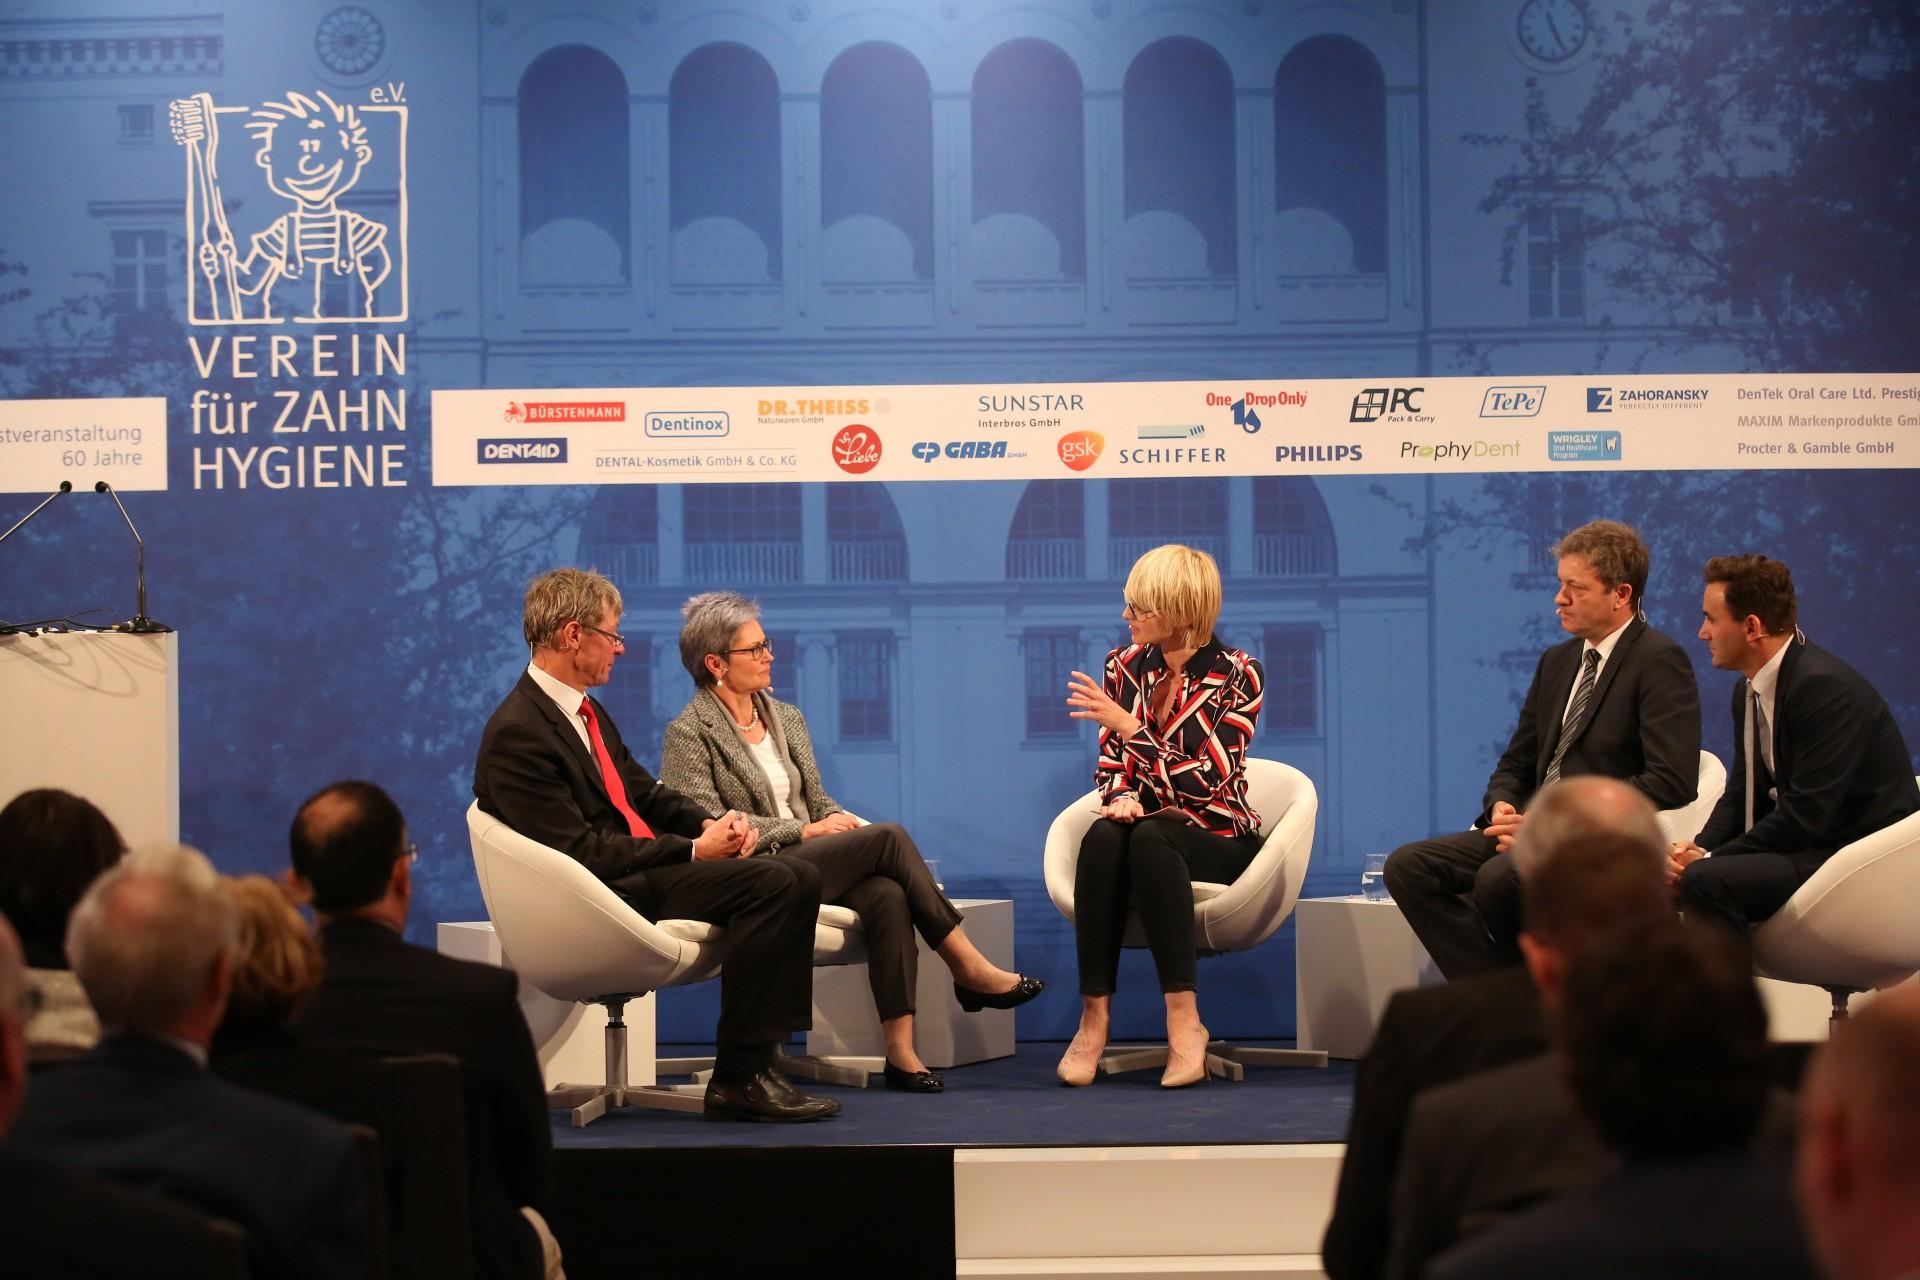 Diskussionsrunde mit Prof.Dr. Dietmar Oesterreich, Prof.Dr.Roswitha Heinrich-Weltzien, Susann Atwell, Prof.Dr.rer.pol Uwe May